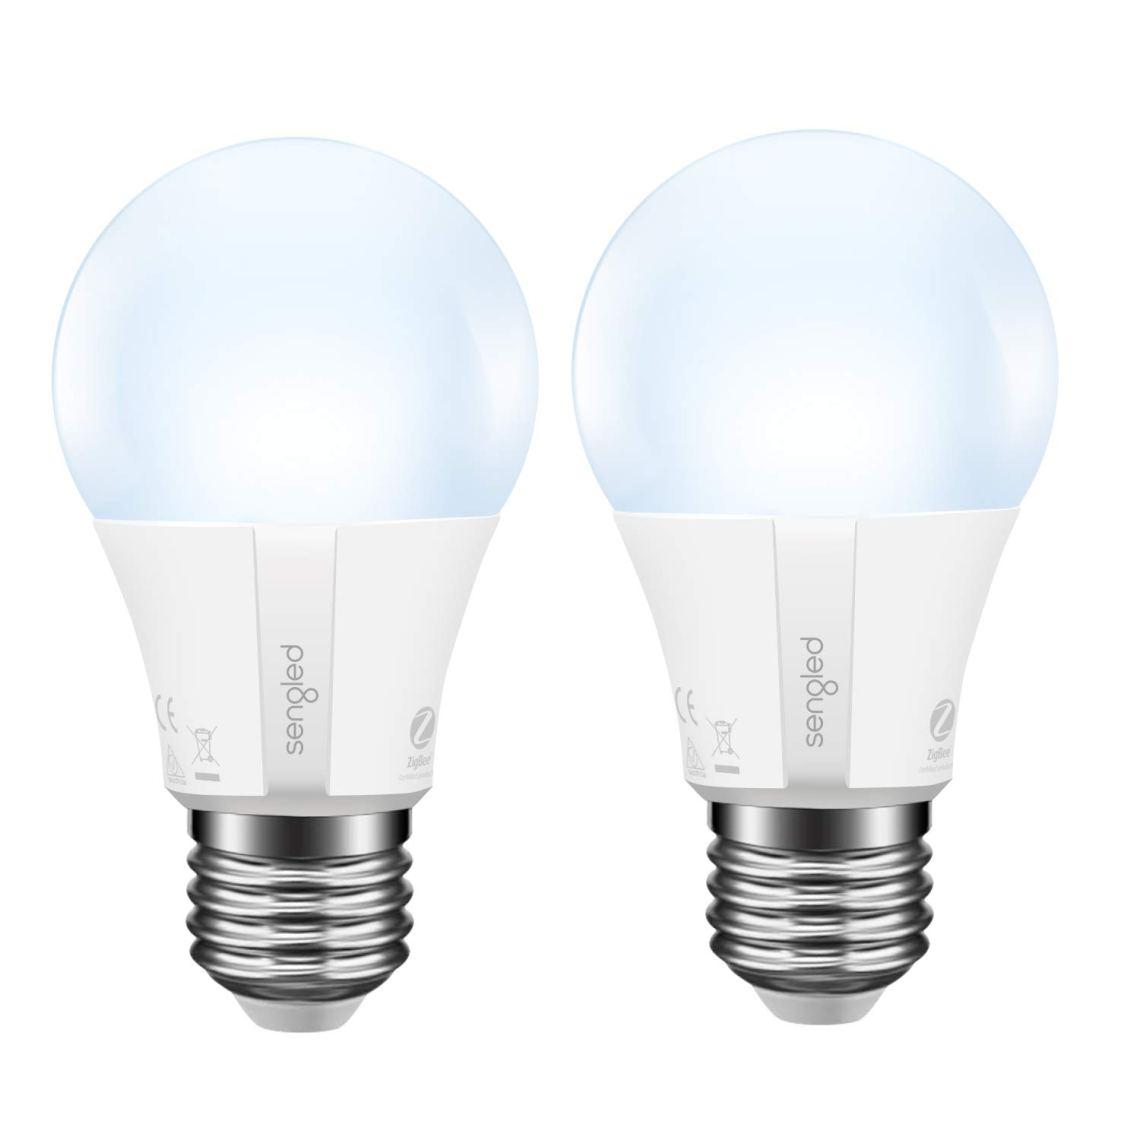 Sengled Smart Light Bulb A19